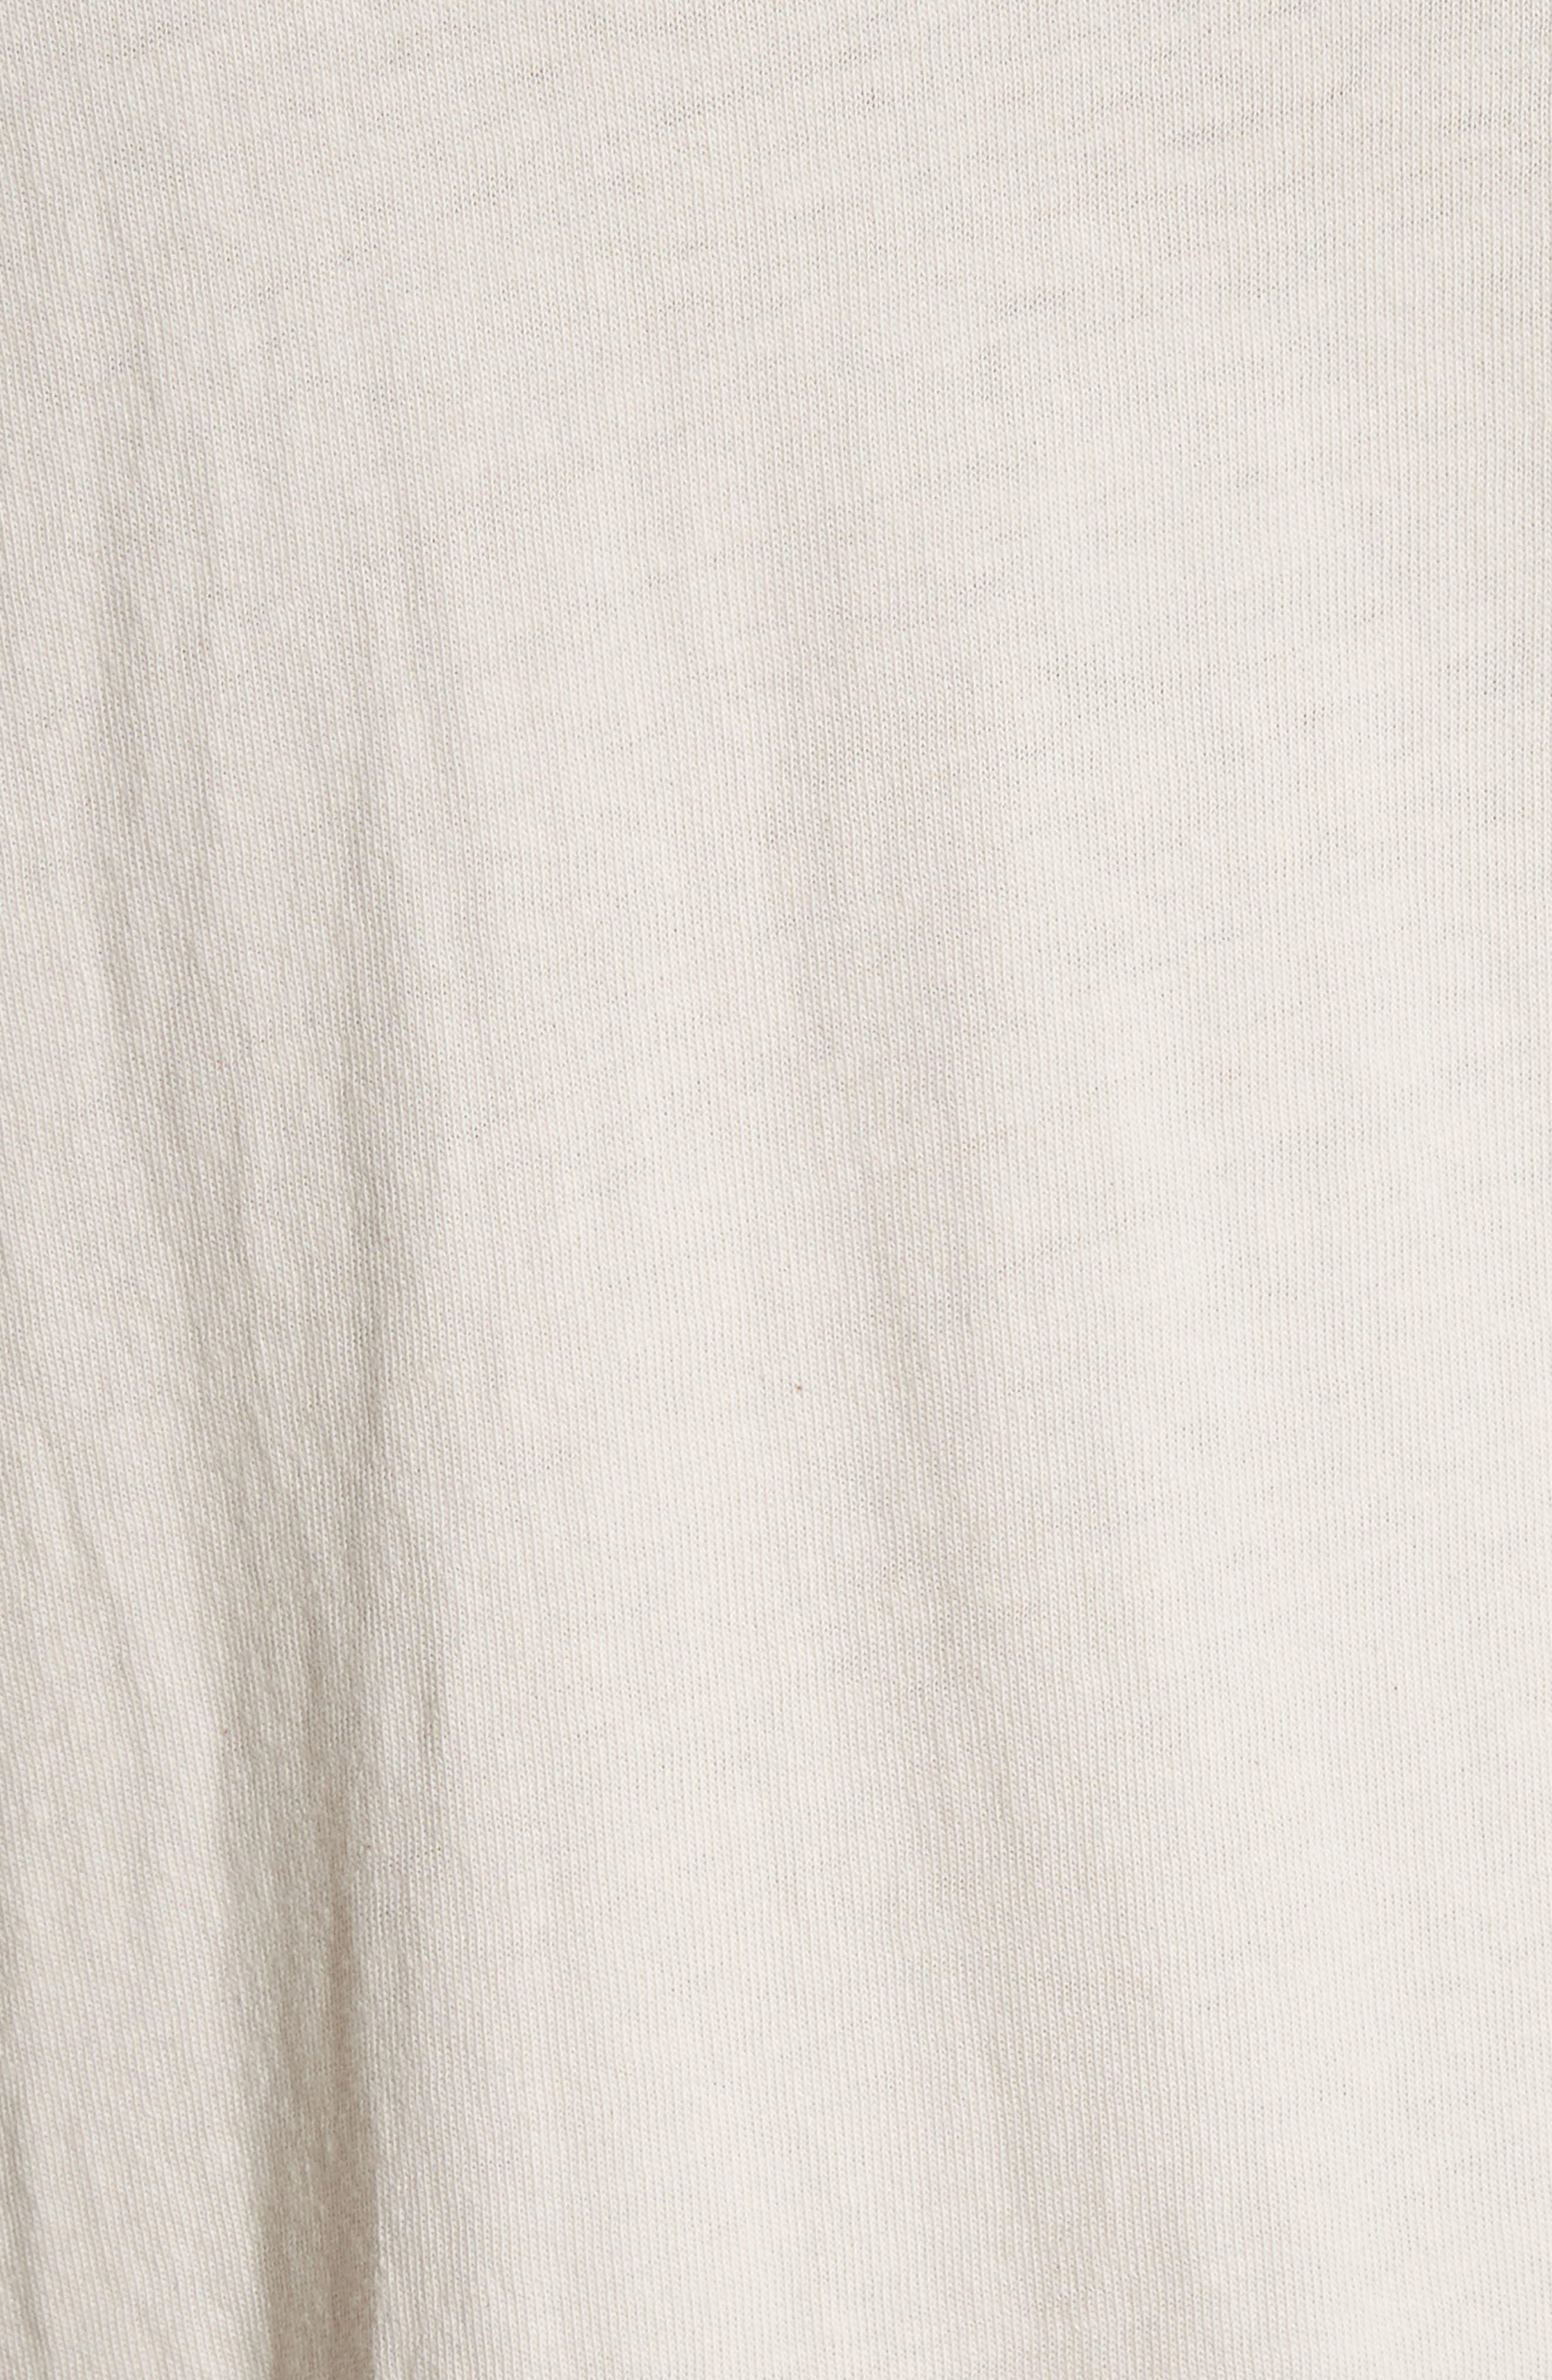 Rolling Stones T-Shirt,                             Alternate thumbnail 5, color,                             WHITE/ BLACK